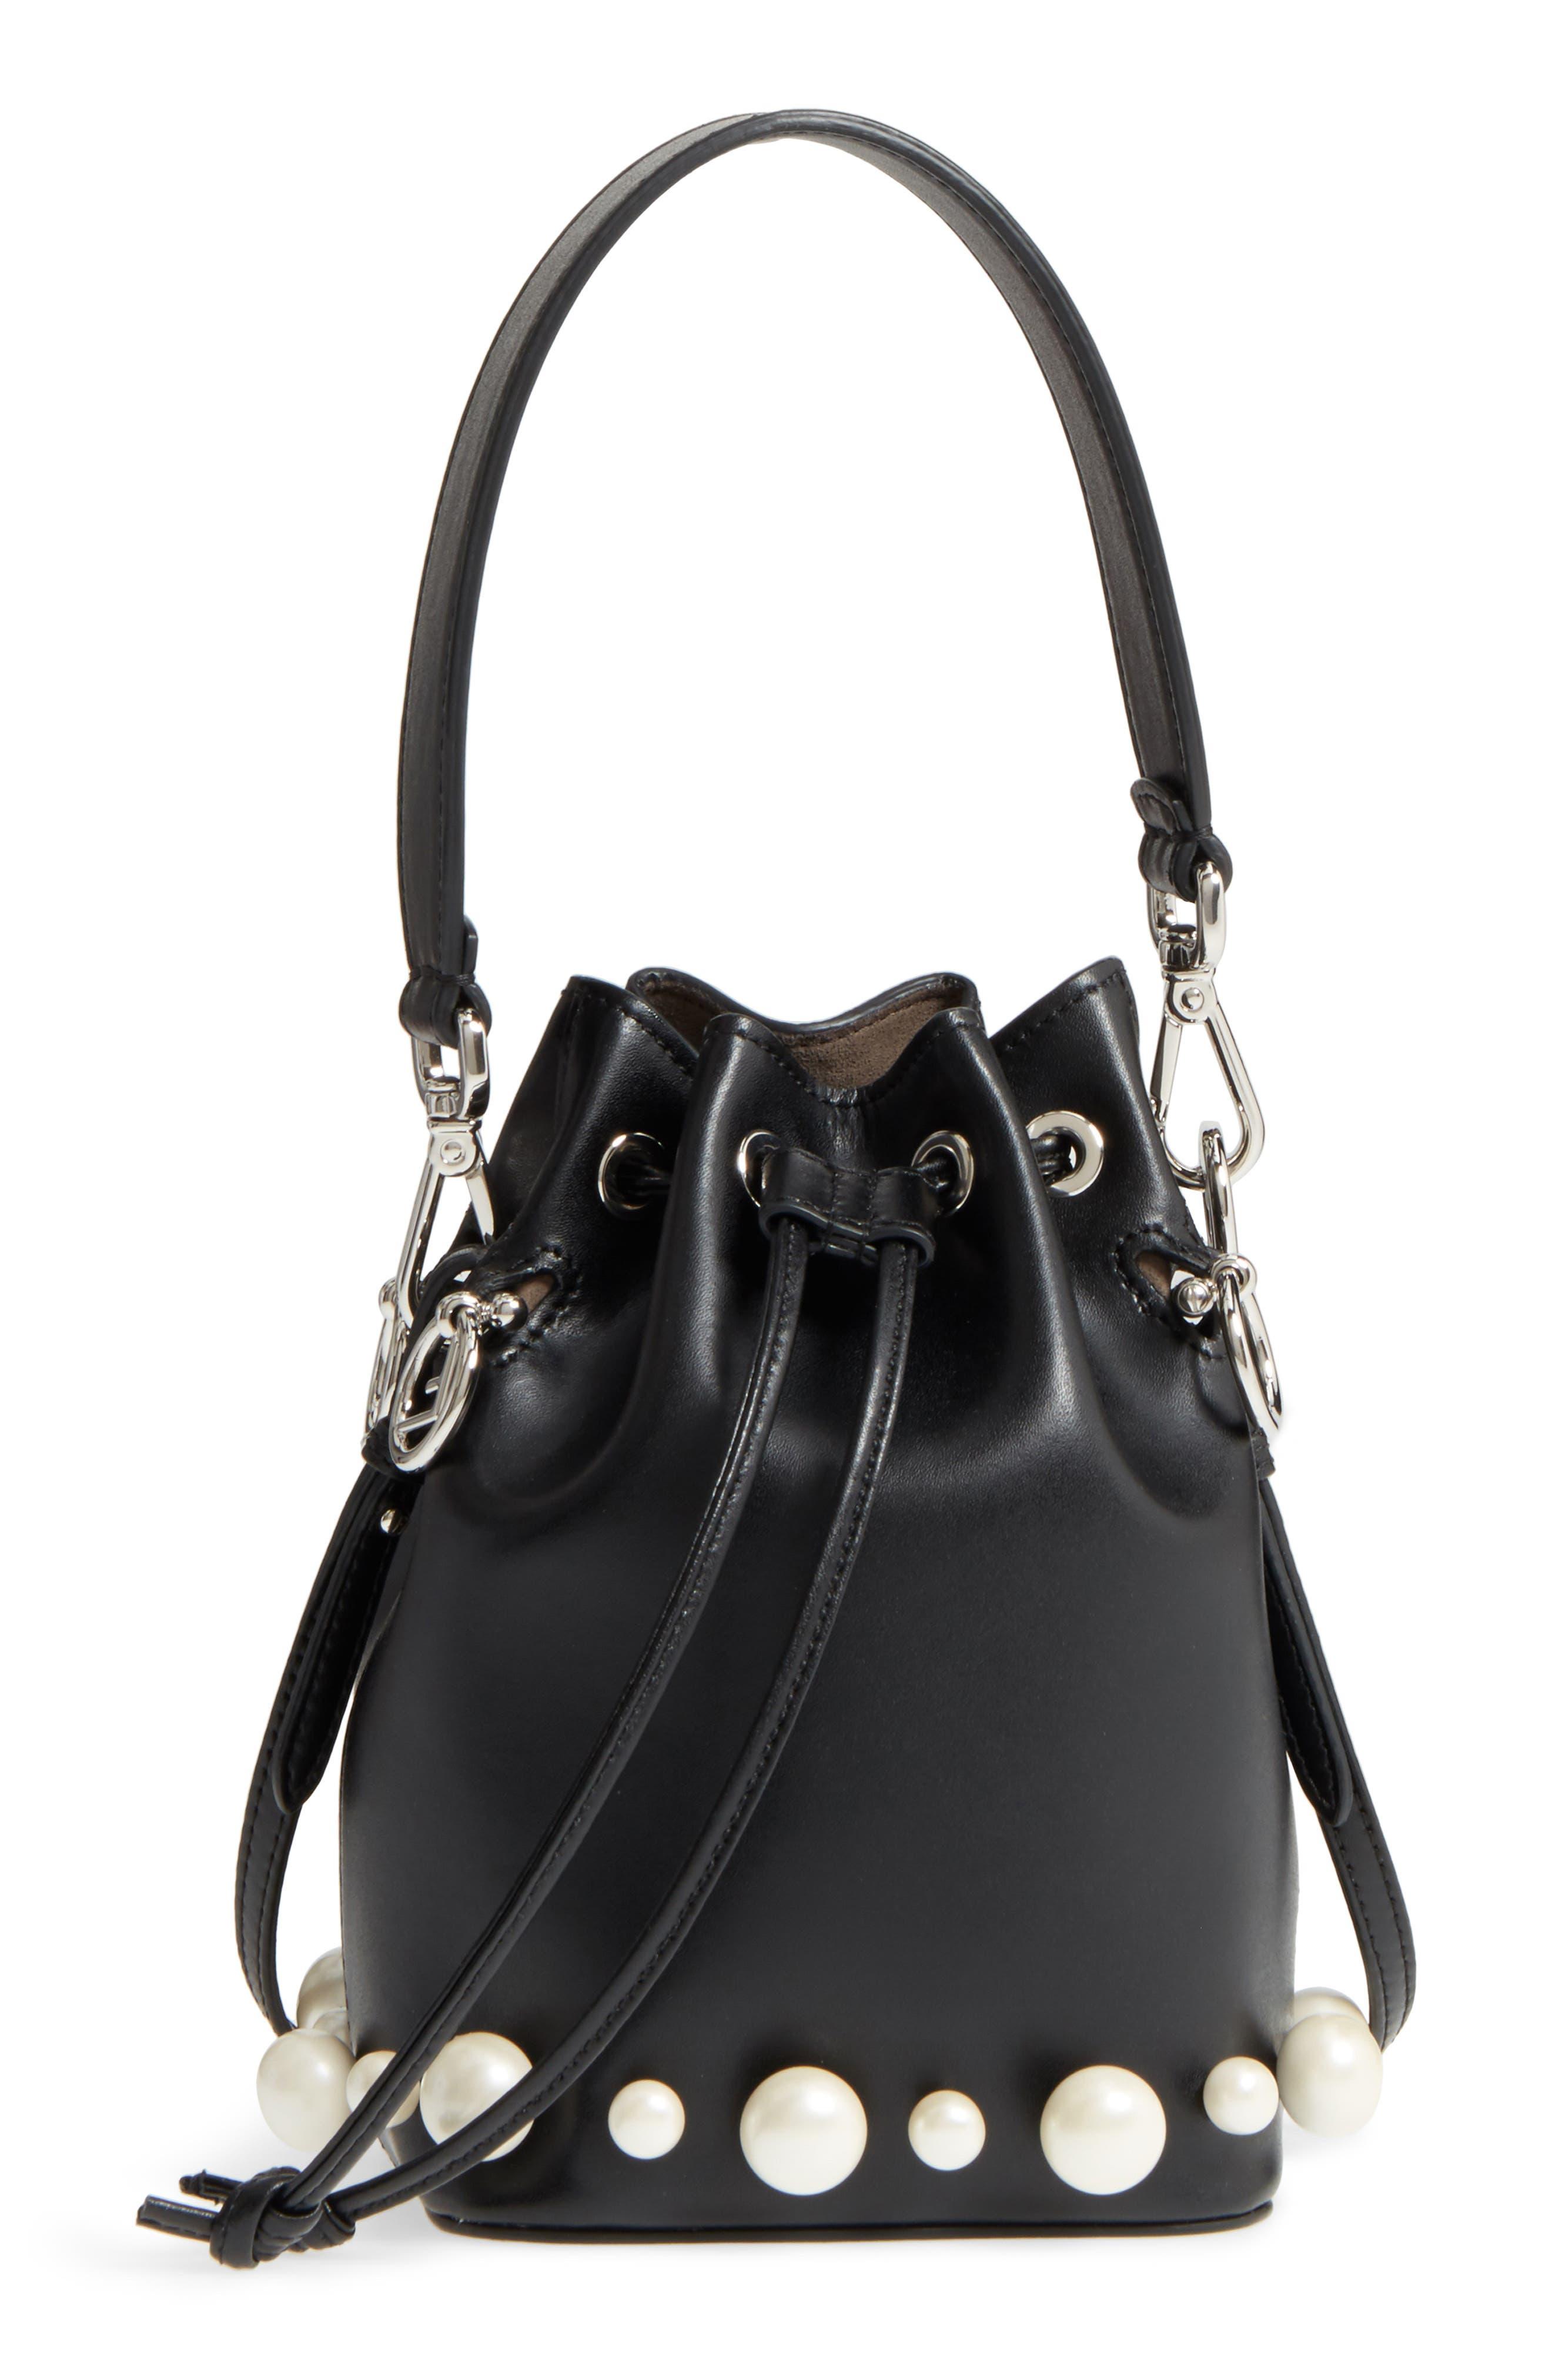 FENDI, Imitation Pearl Calfskin Bucket Bag, Main thumbnail 1, color, BLACK